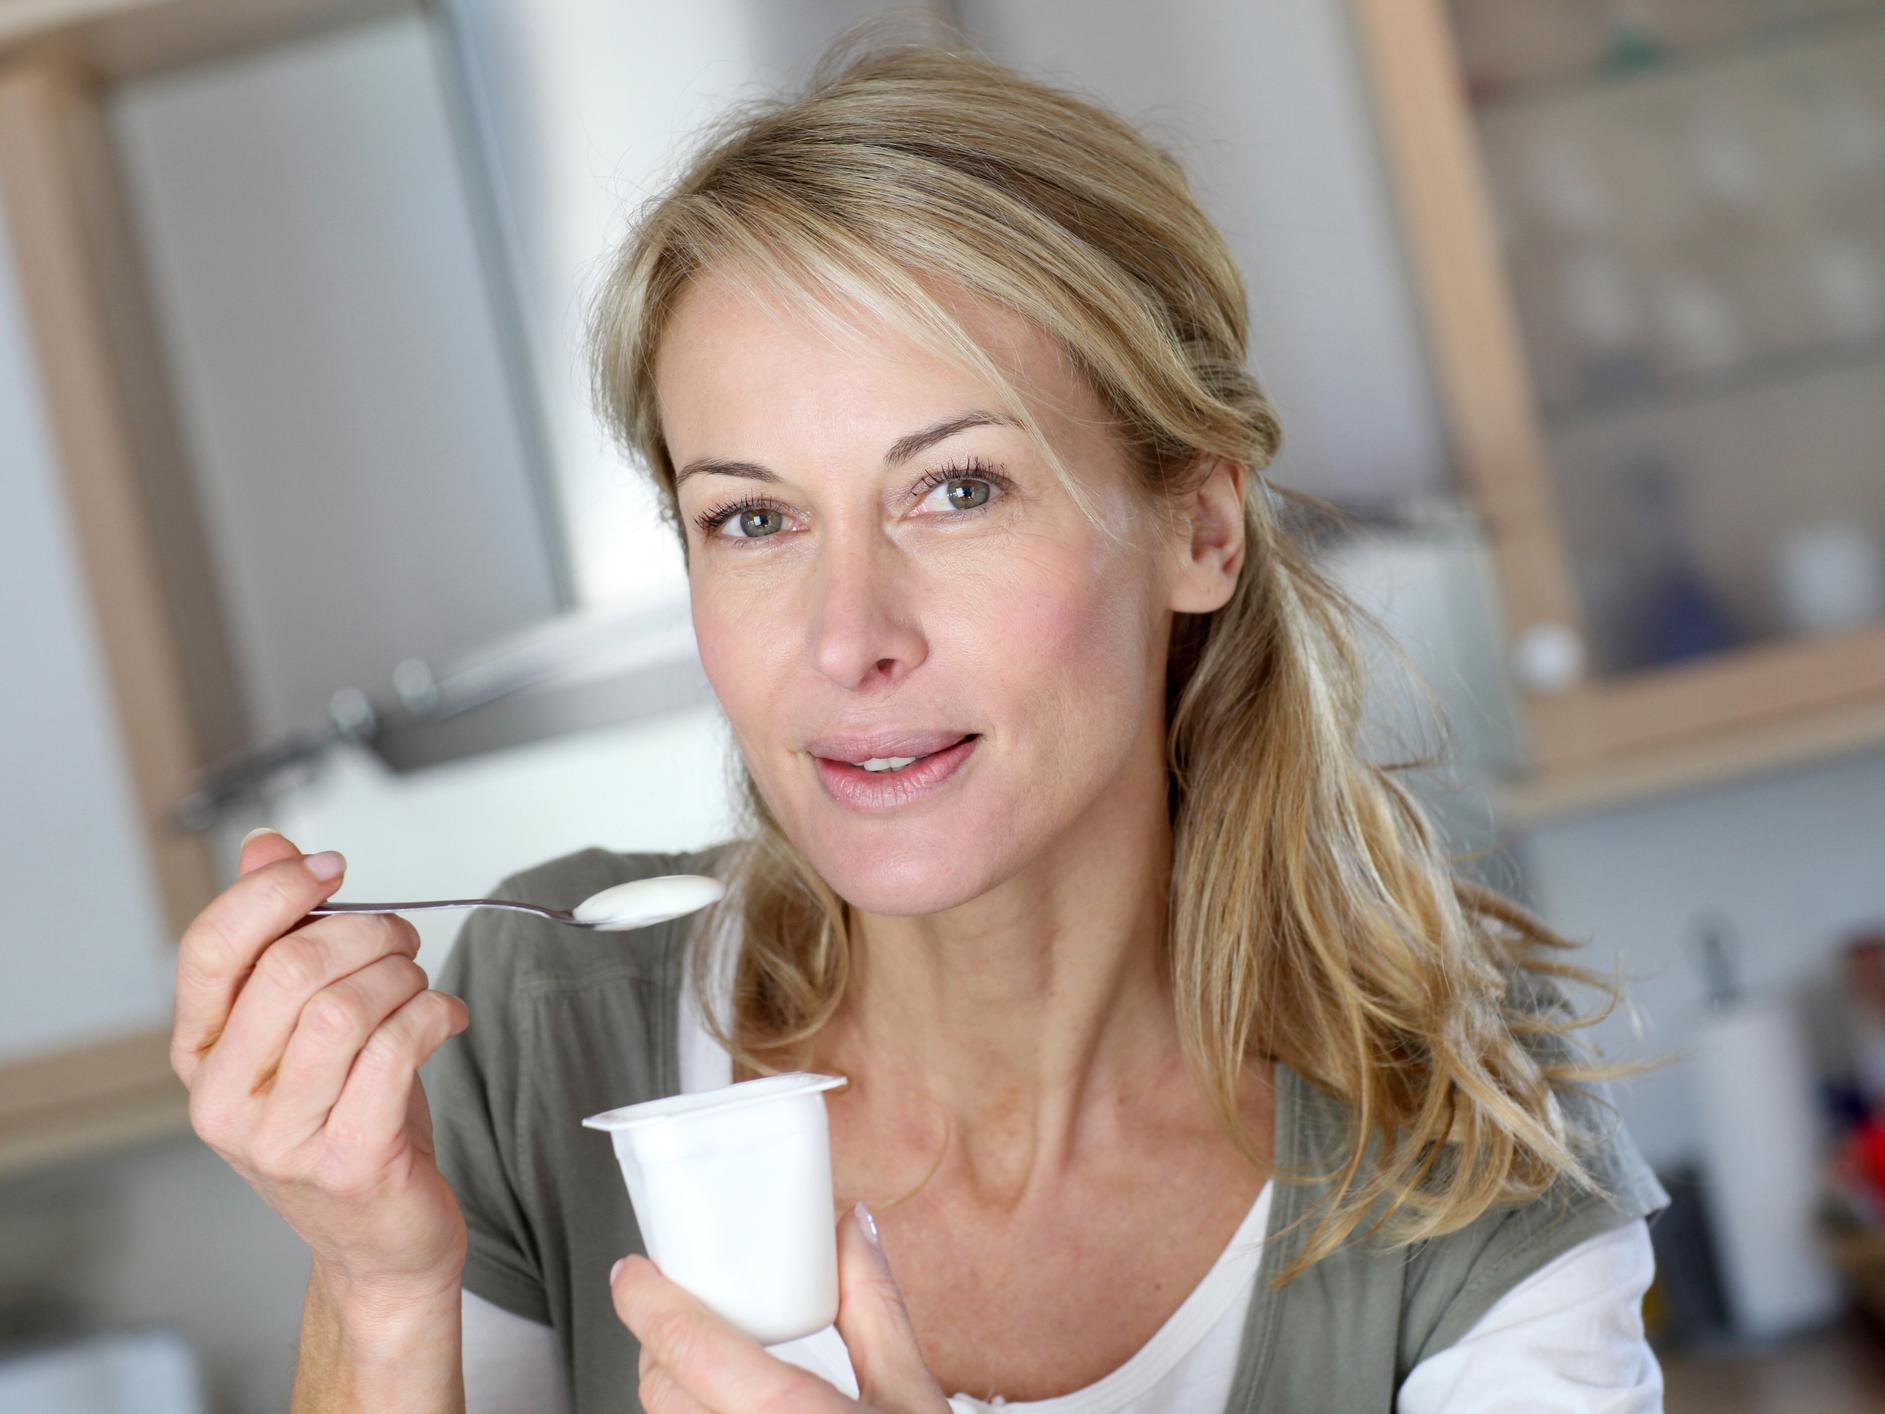 The surprising reason yogurt lowers breast cancer risk